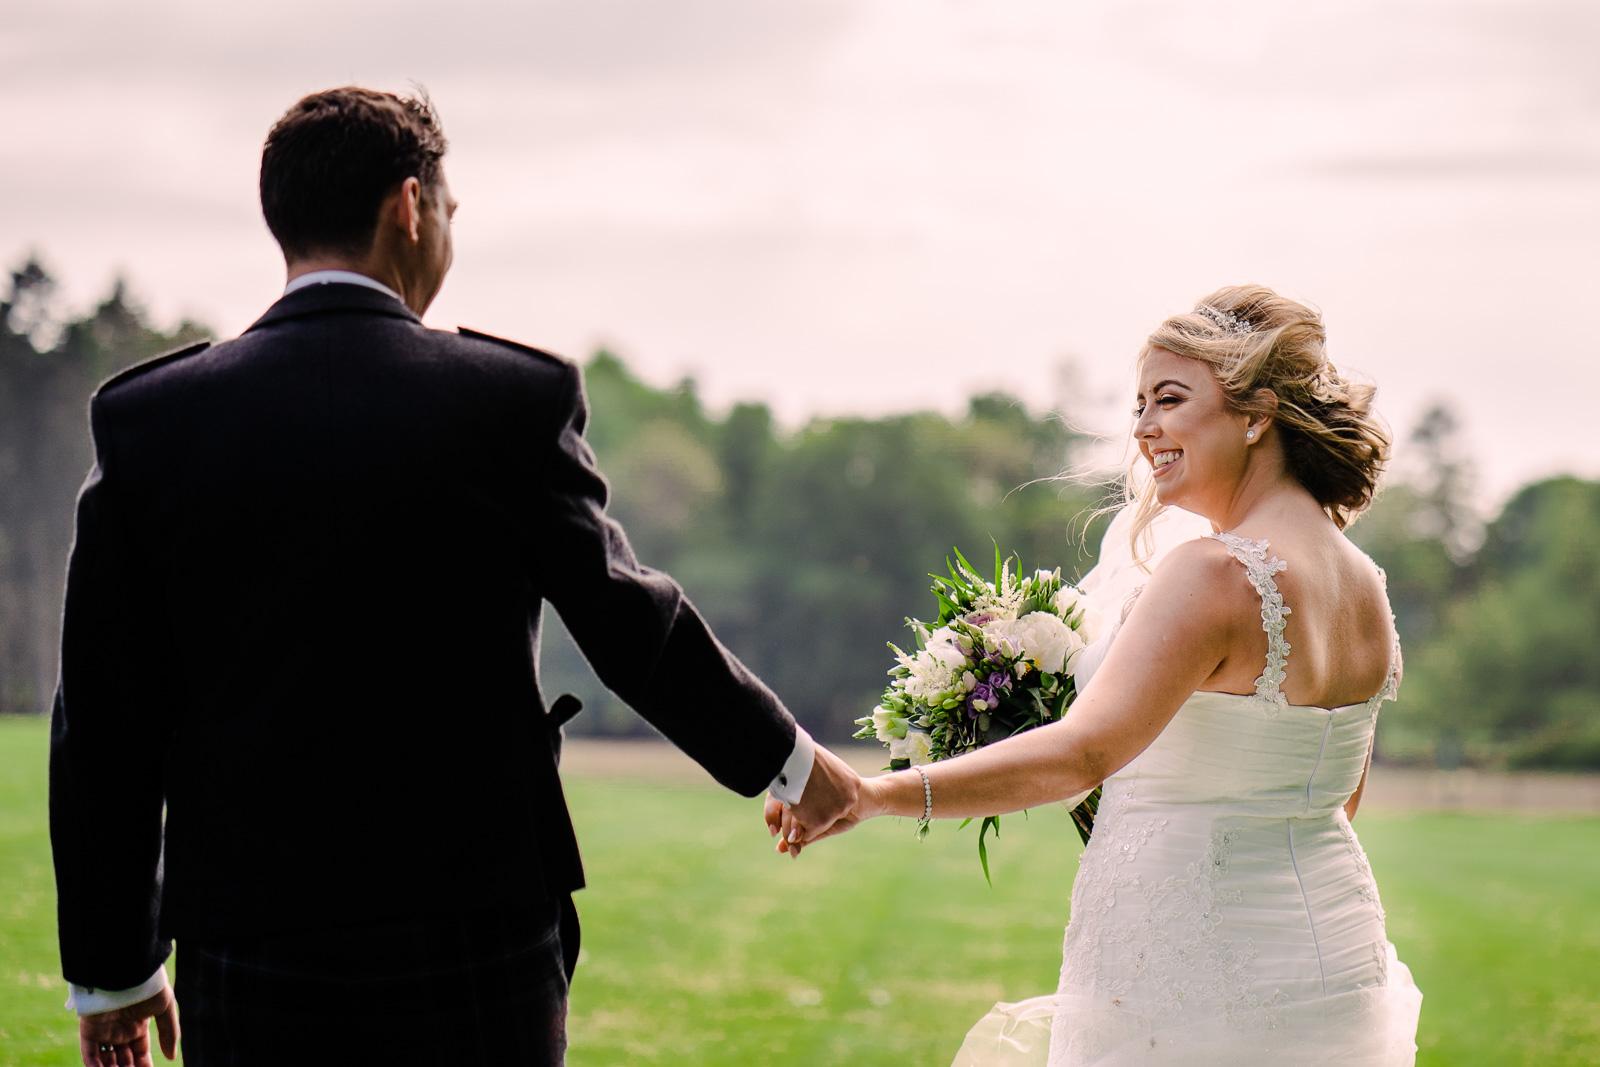 cornhill_castle_wedding_biggar_dearlyphotography (215 of 448).jpg